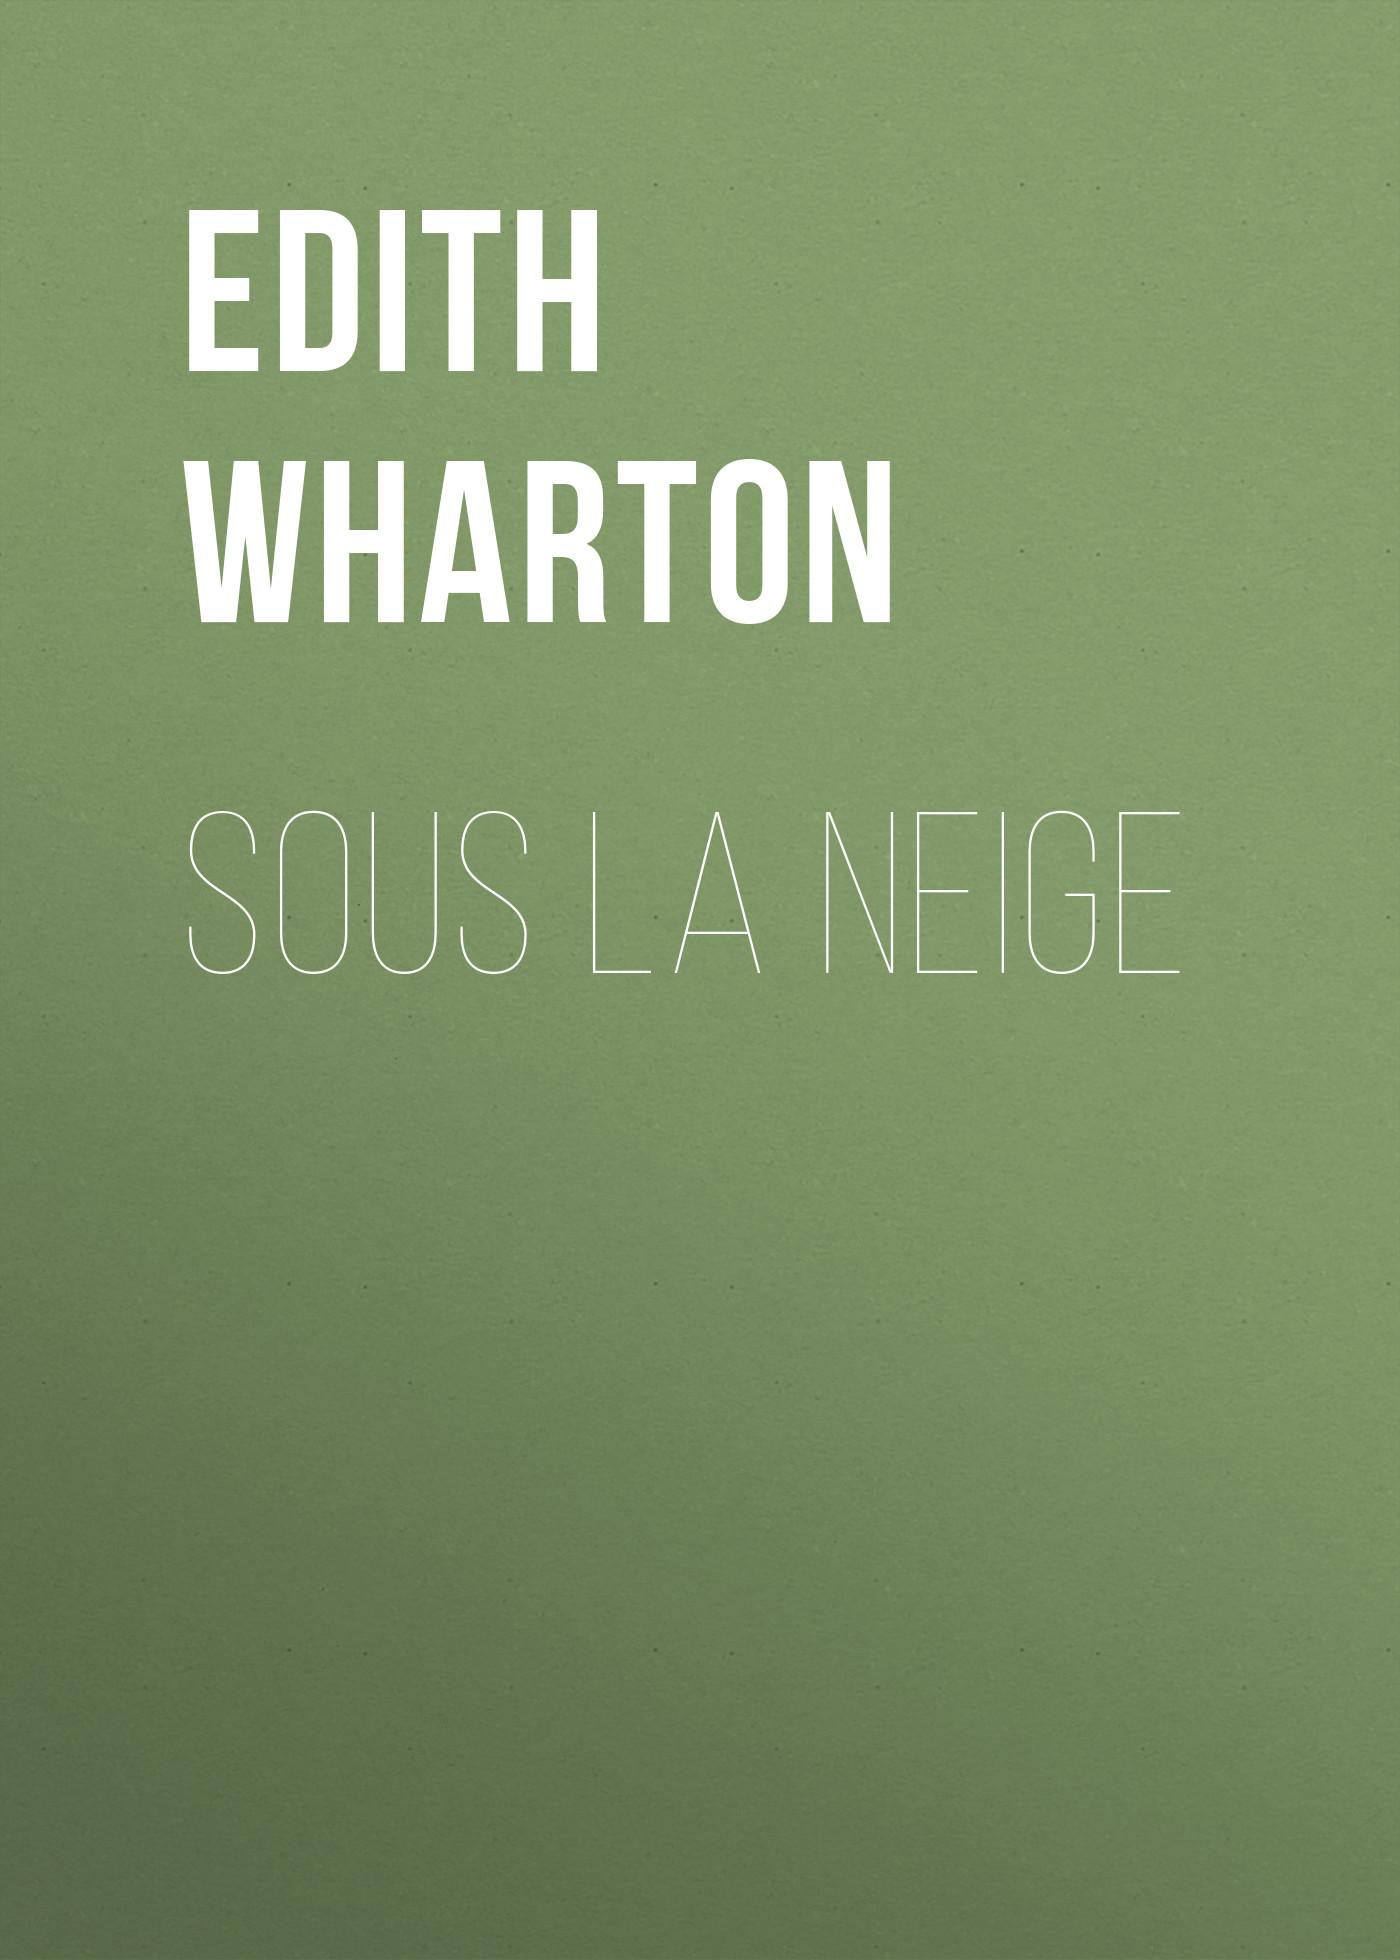 Edith Wharton Sous la neige ковры seintex opel zafira c 2012 высокий борт